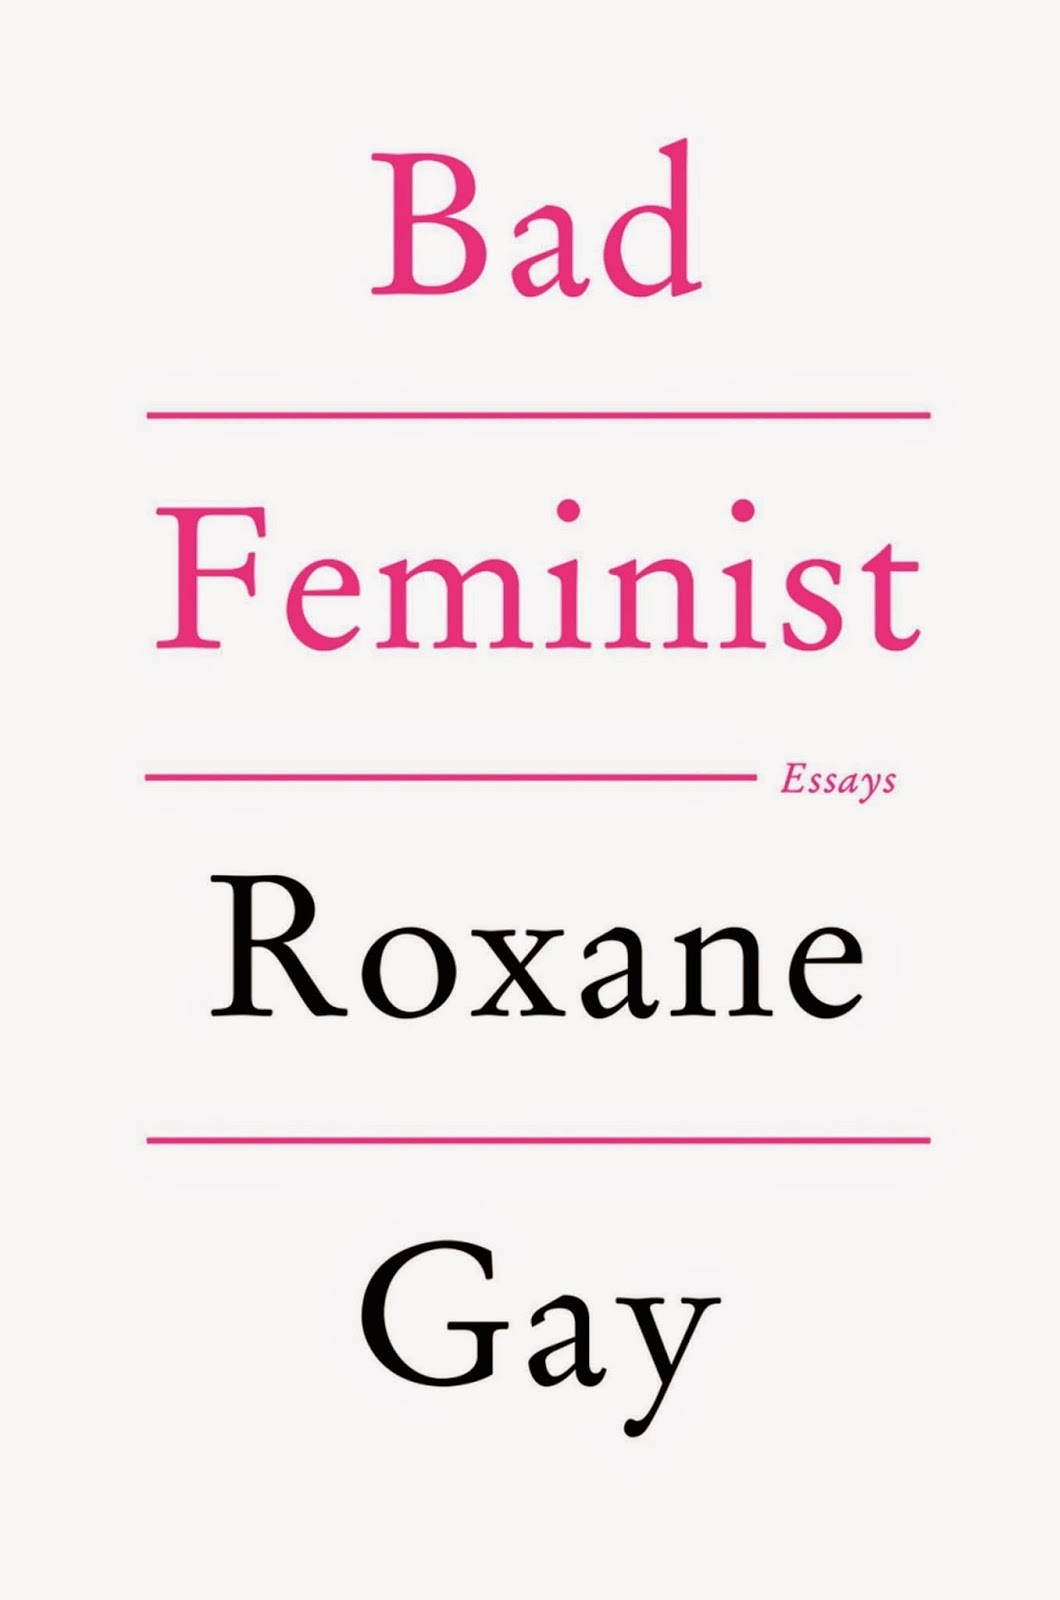 http://www.bookdepository.com/Bad-Feminist-Roxane-Gay/9781472119735/?a_aid=jbblkh